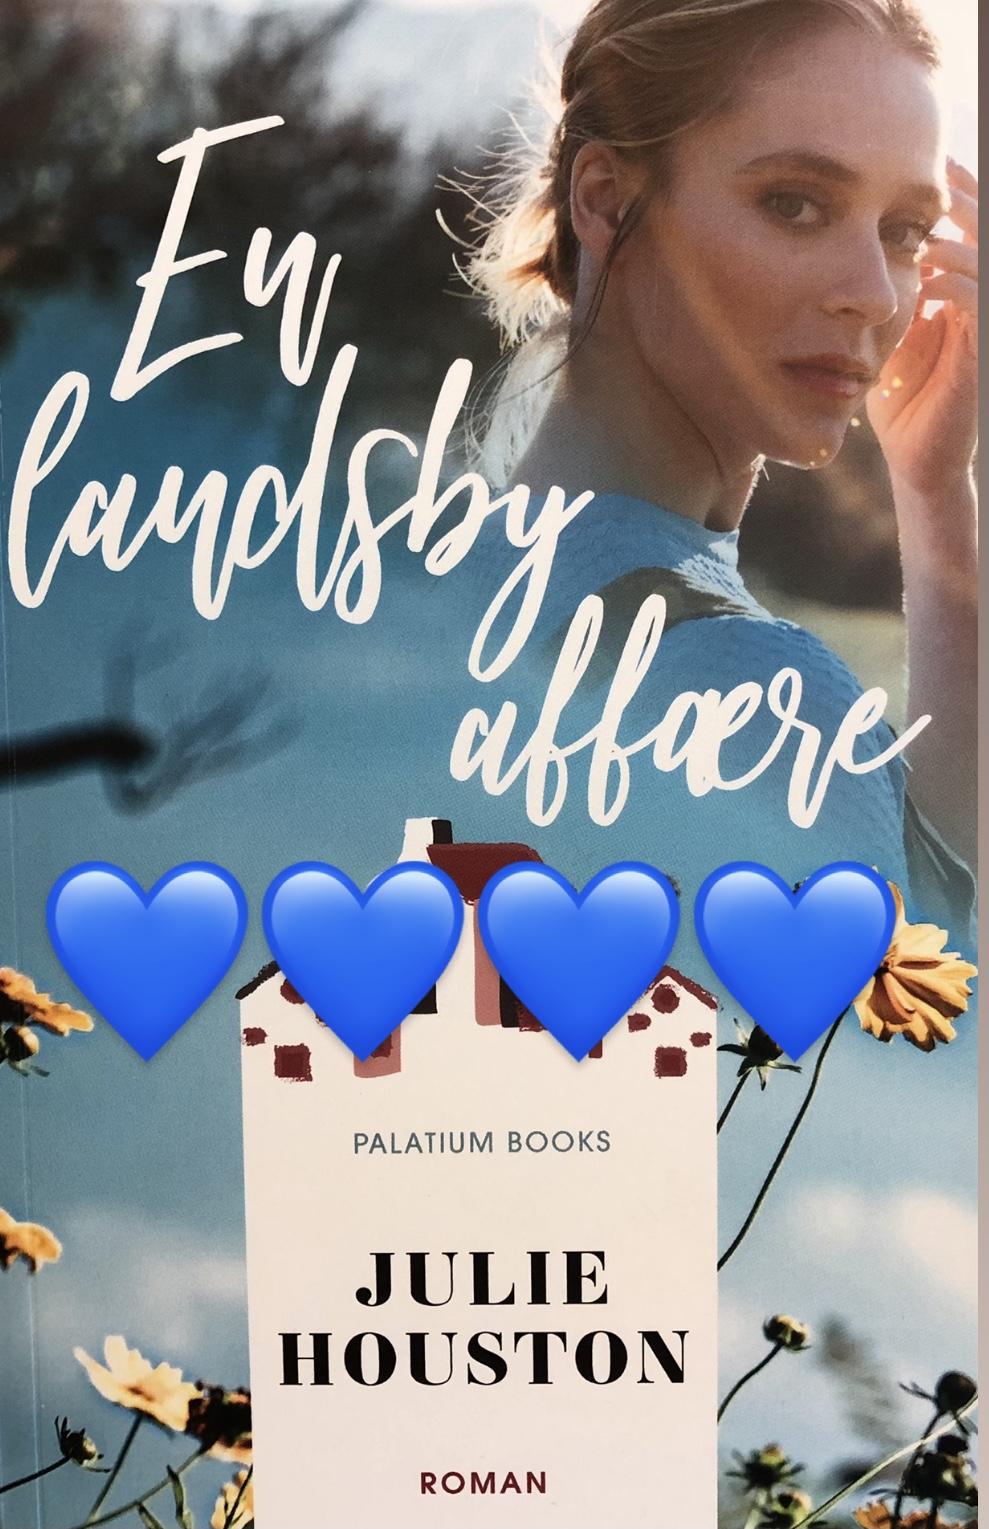 En landsby affære, Julie Houston, Palatium Books, Palatium, kærlighed, utroskab, Roman, krummeskrummelurer, krummeskrummelurer.dk, boganmeldelse, anbefaling, anmeldereksemplar,